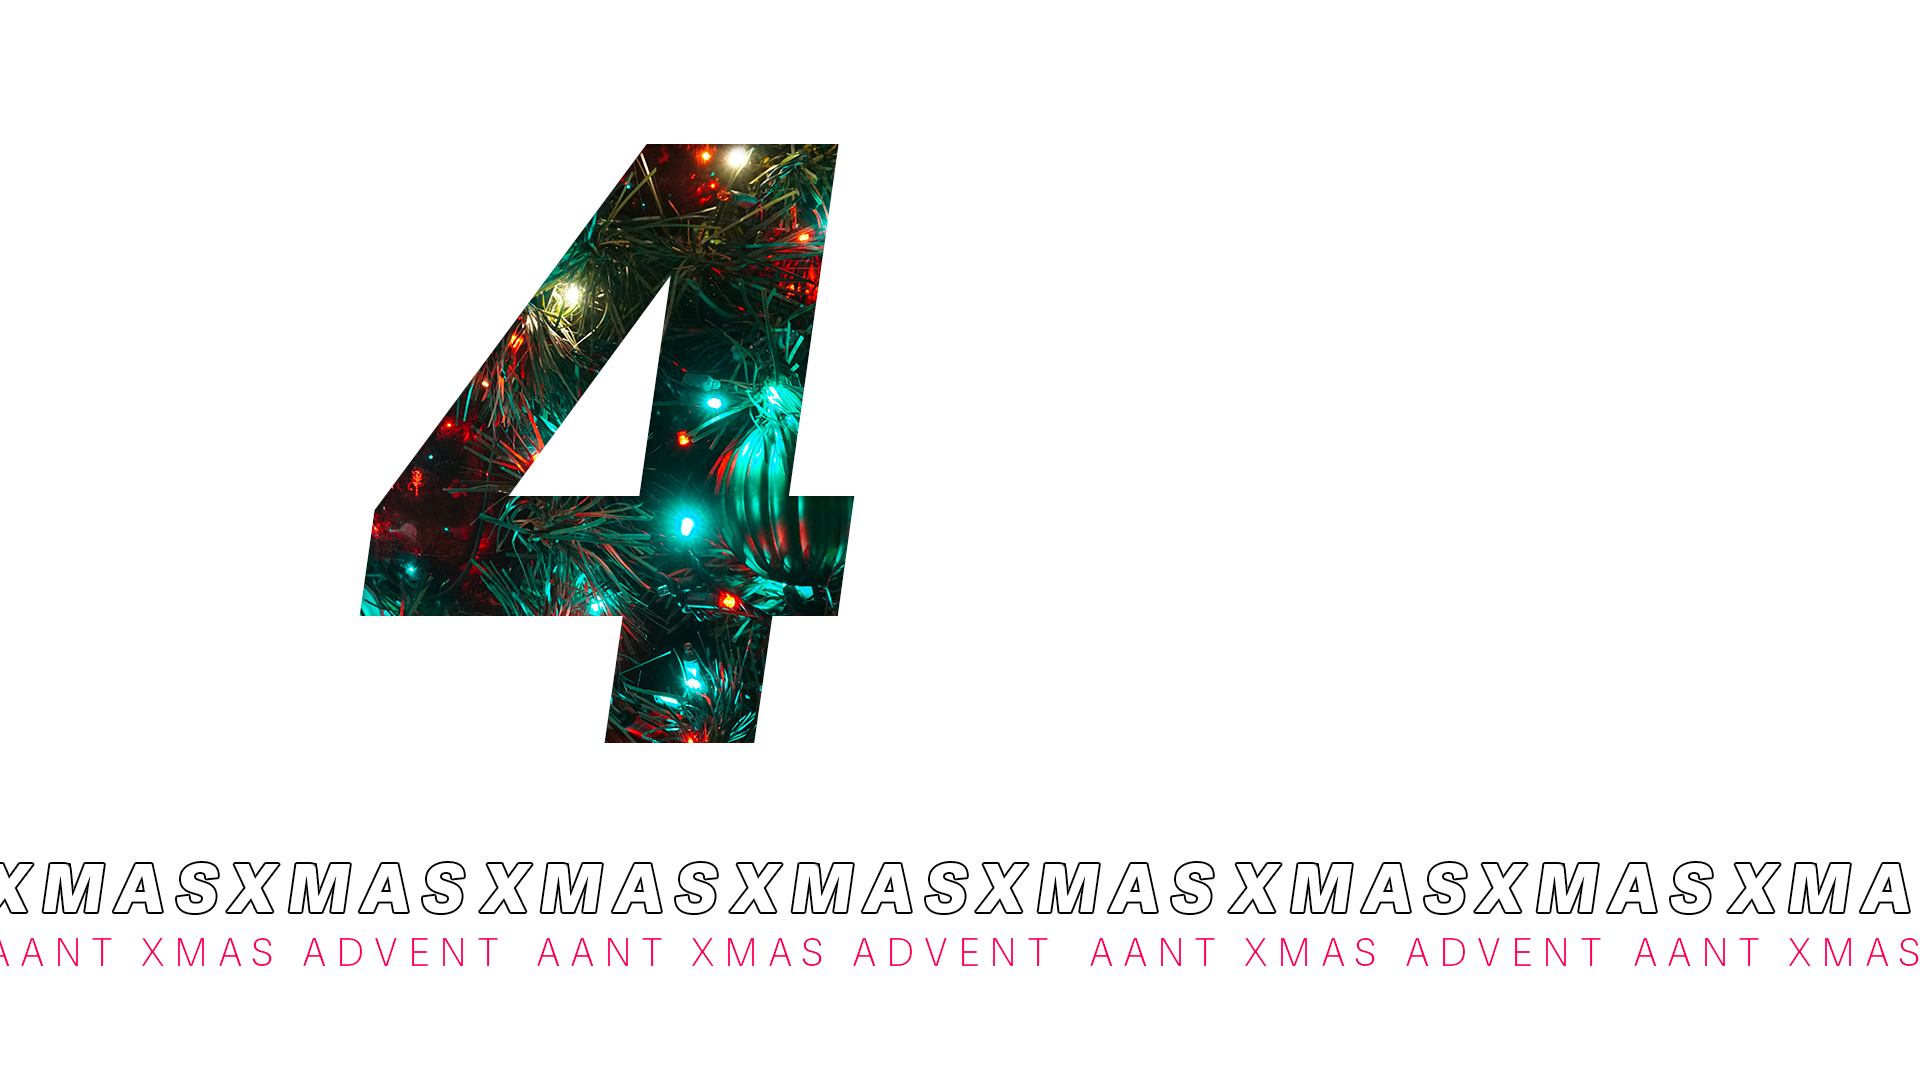 AANT XMAS ADVENT – 4 DICEMBRE 2020